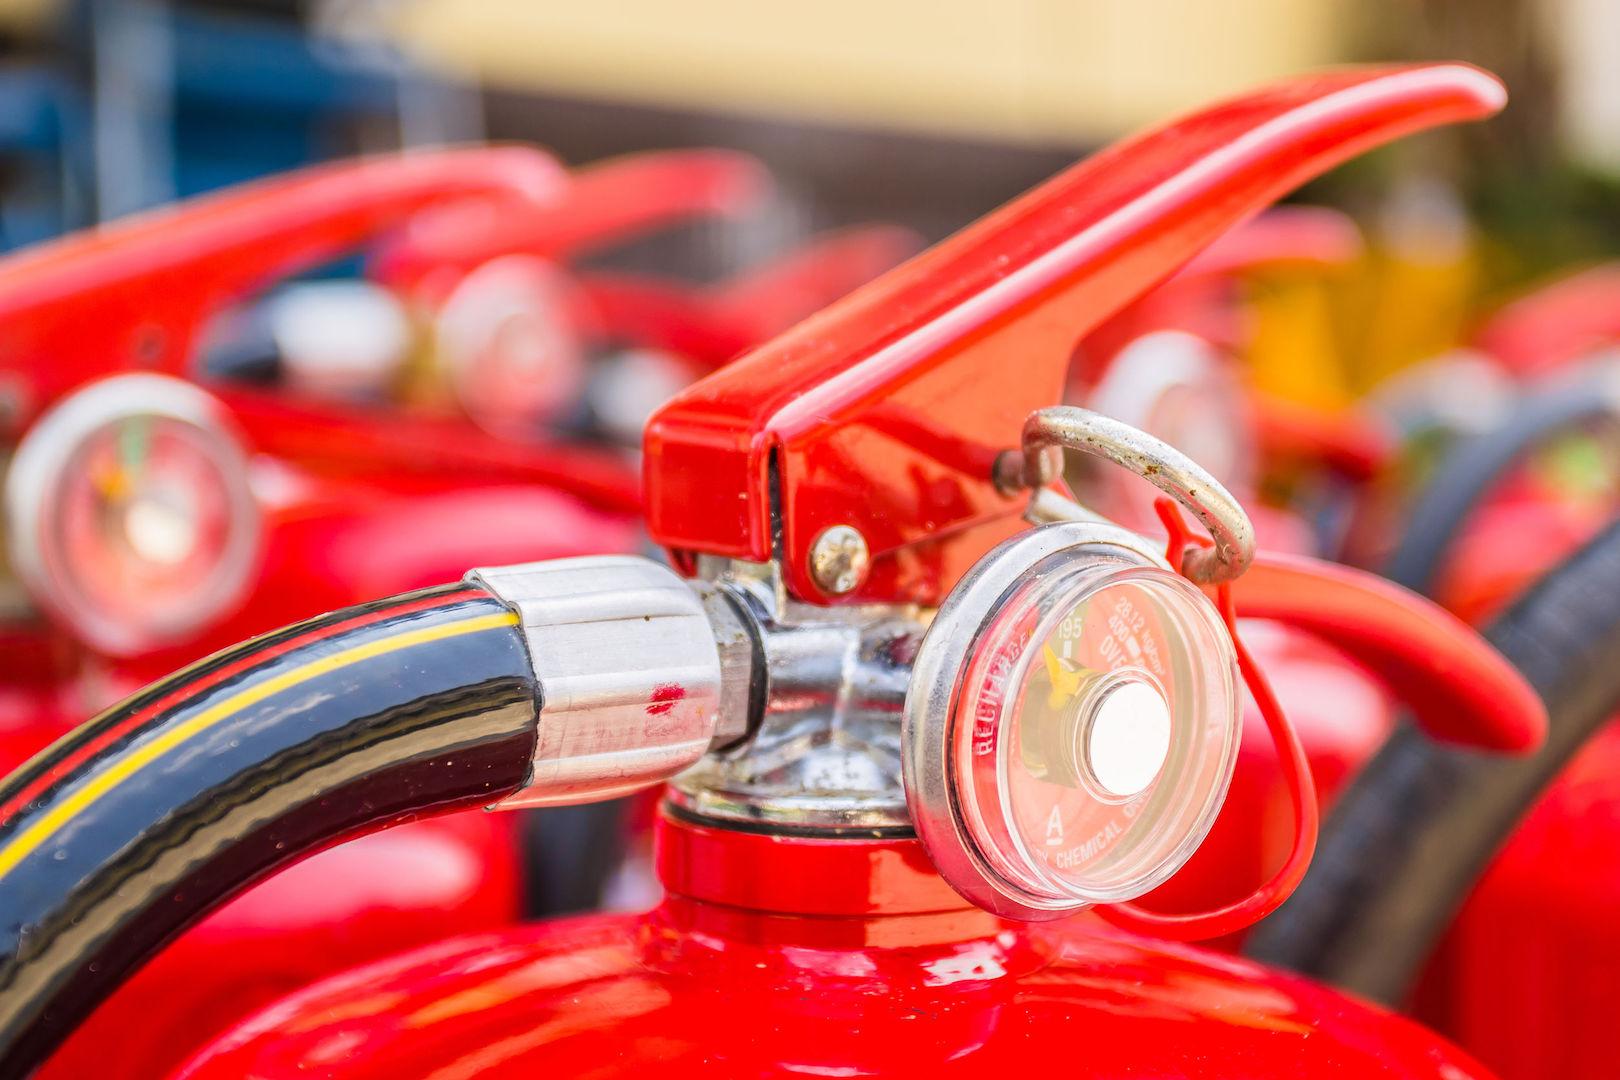 Investa adopts national fire strategy for its $12 billion property portfolio